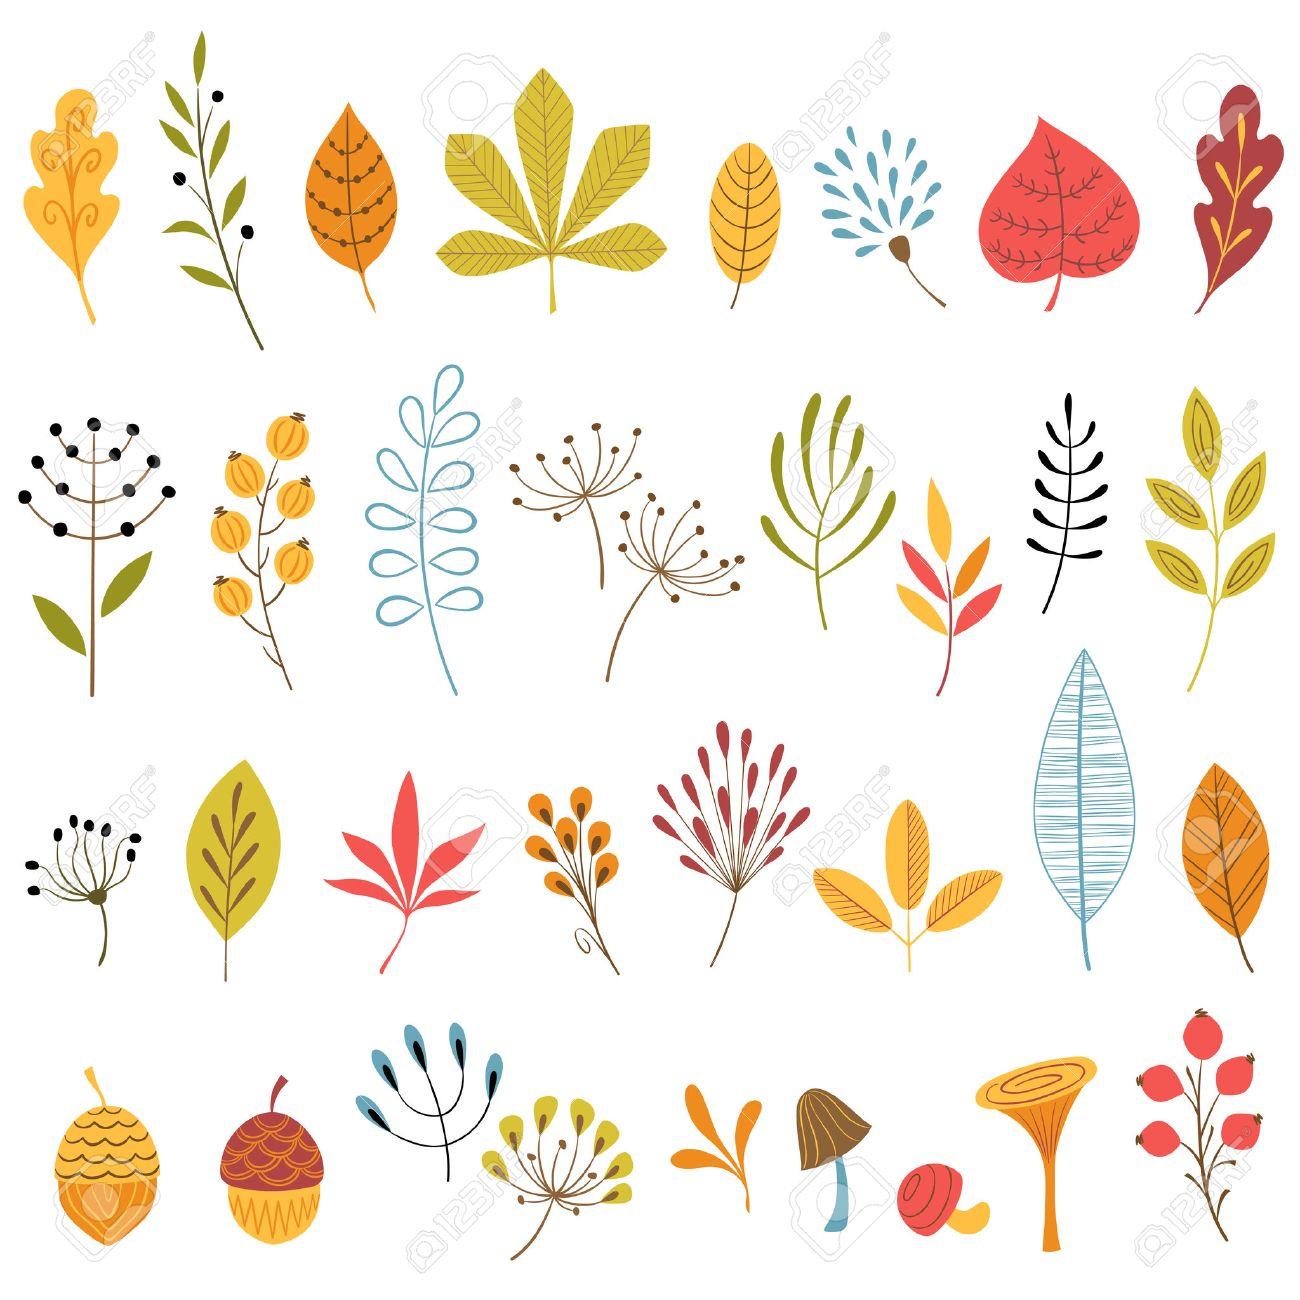 Set of hand drawn autumn floral design elements. - 23288595